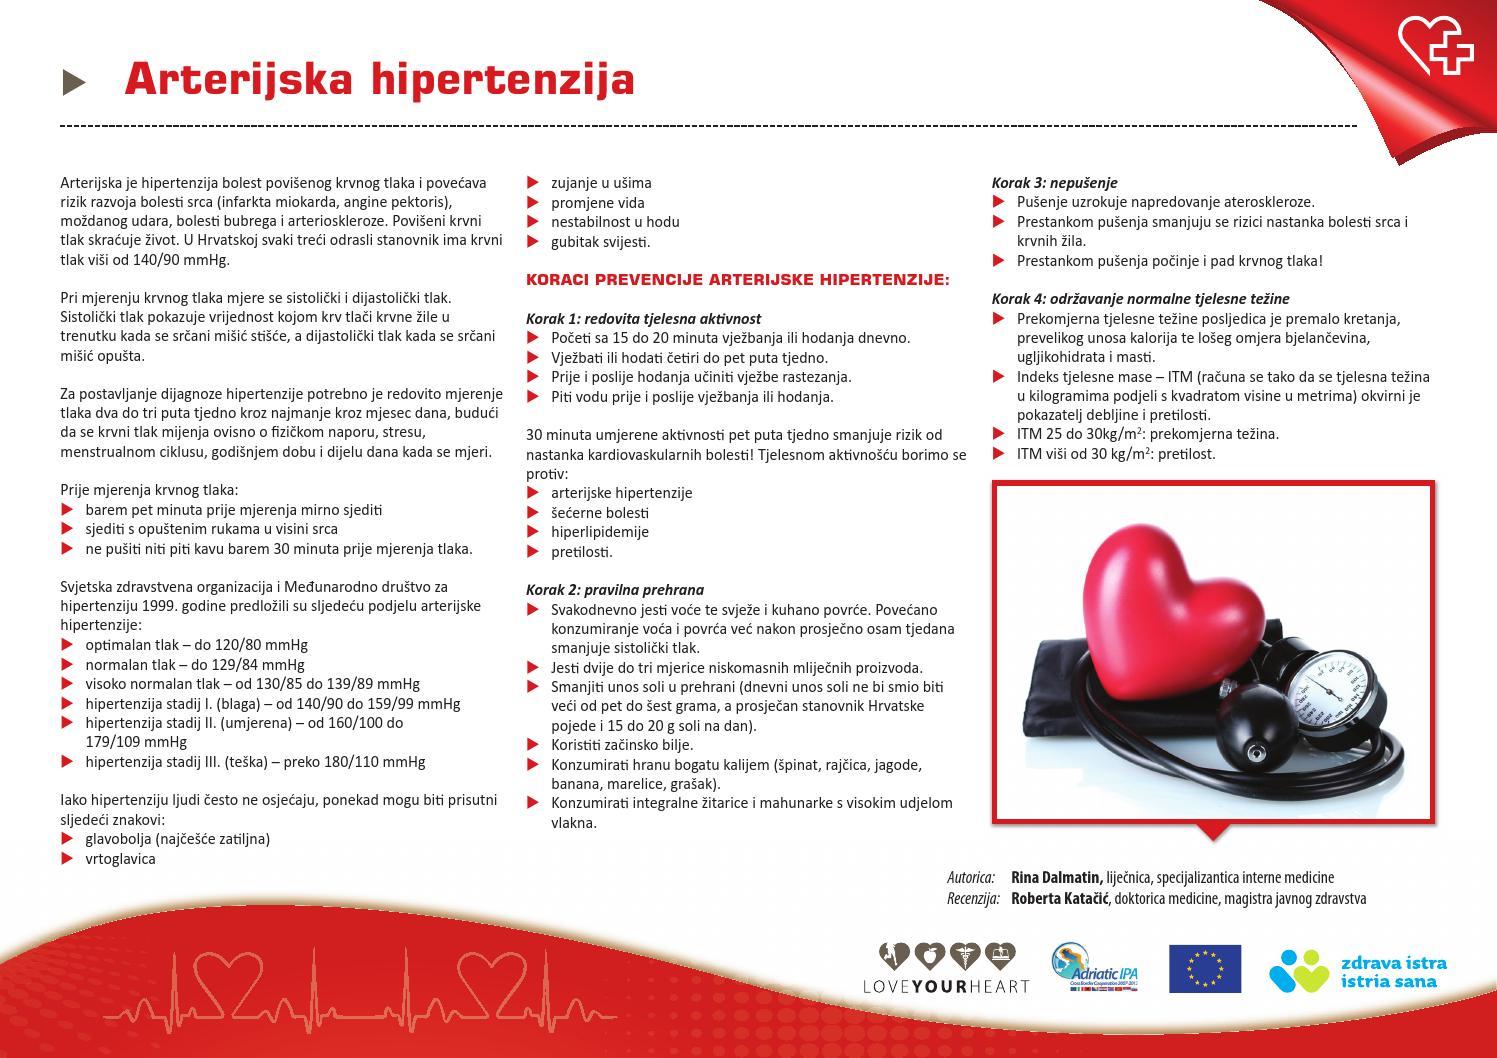 hipertenzije i nestabilnost